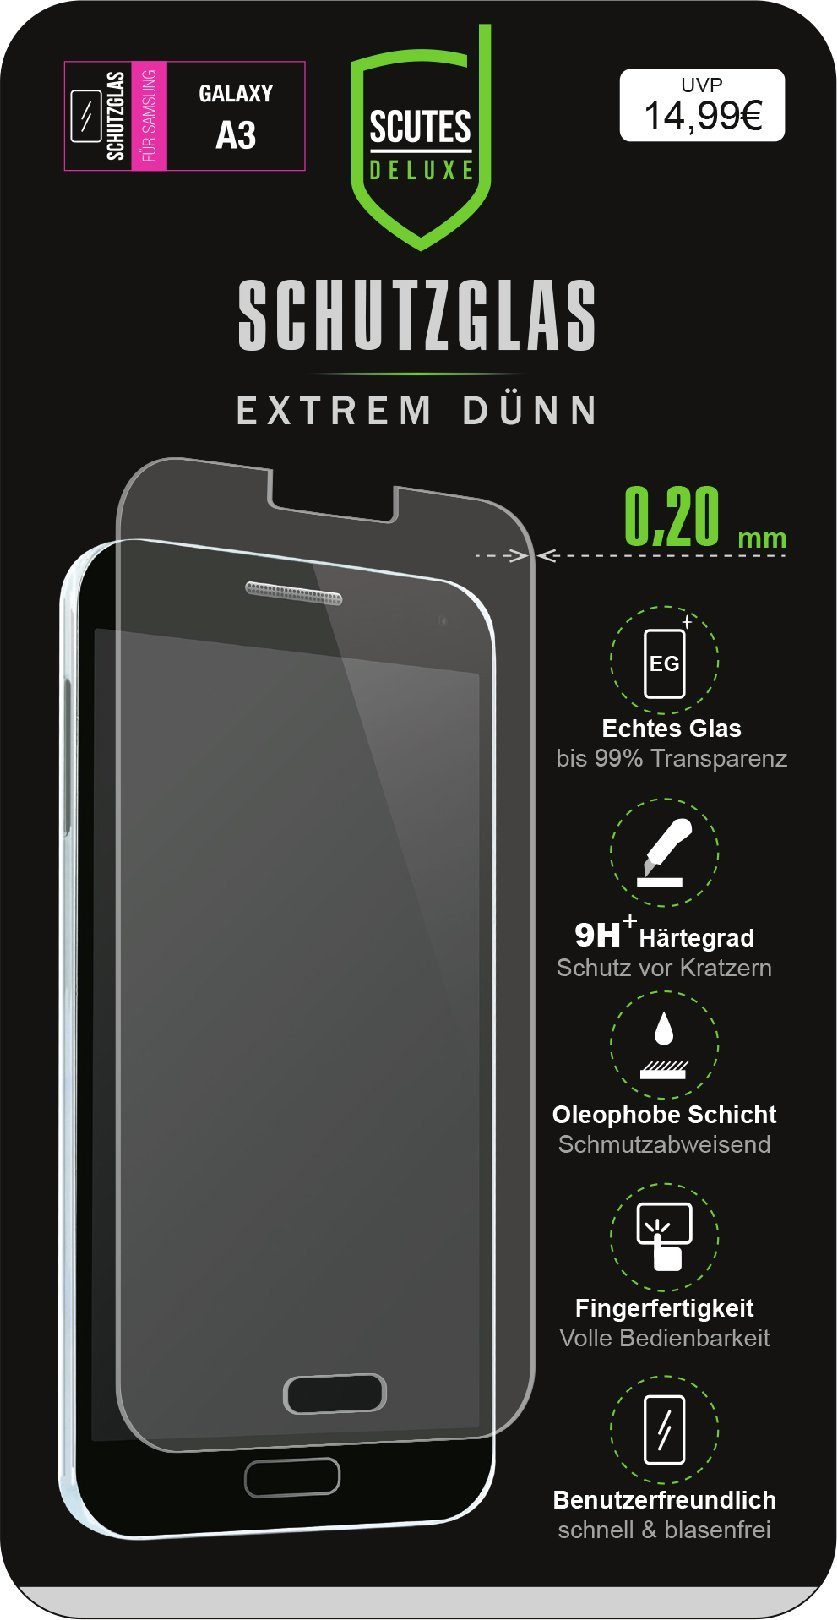 Scutes Deluxe Schutzglas Samsung A3 0,20 mm 9H »(Tablet/Smartphone)«